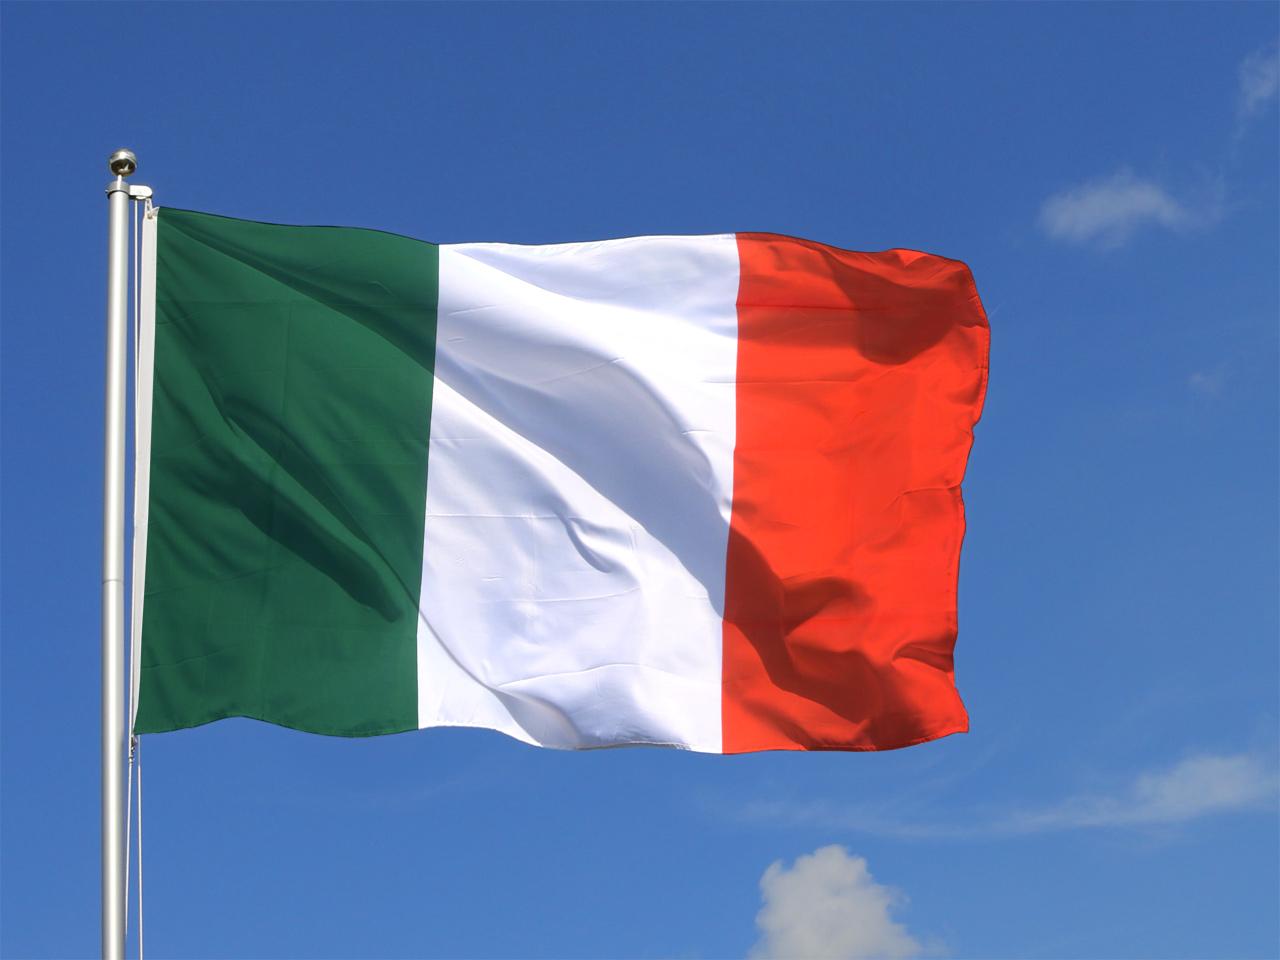 Italienische fahne farben